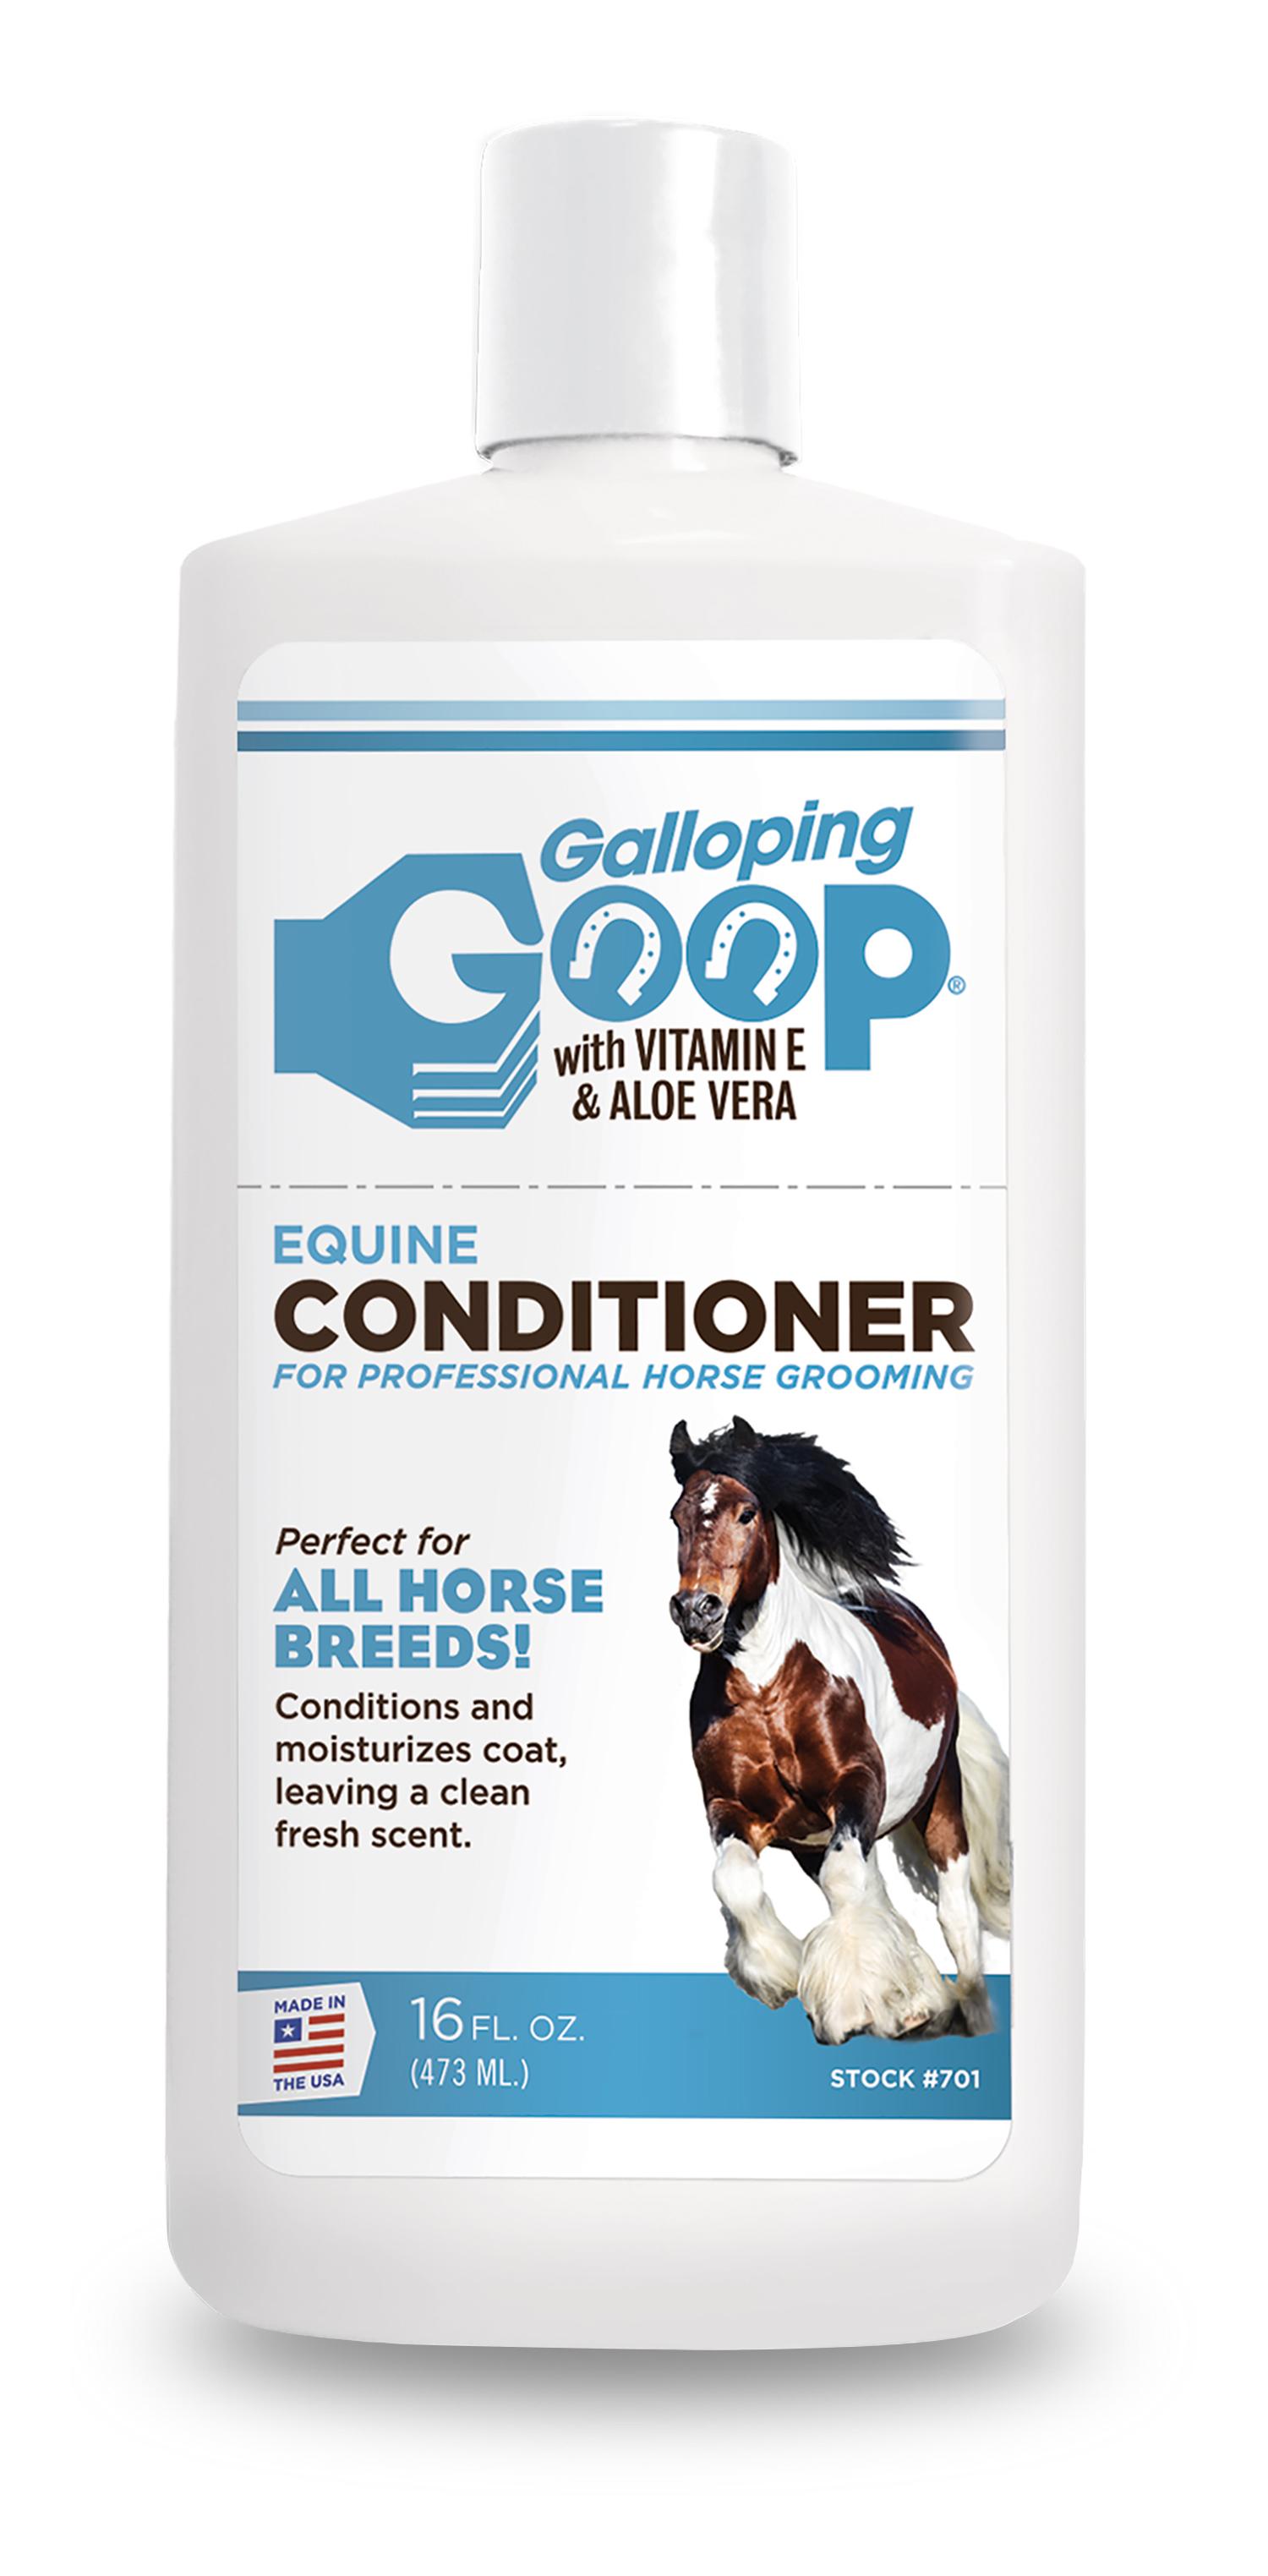 Moms-Goop-Galloping-701-ConditionerBottle16oz.jpg